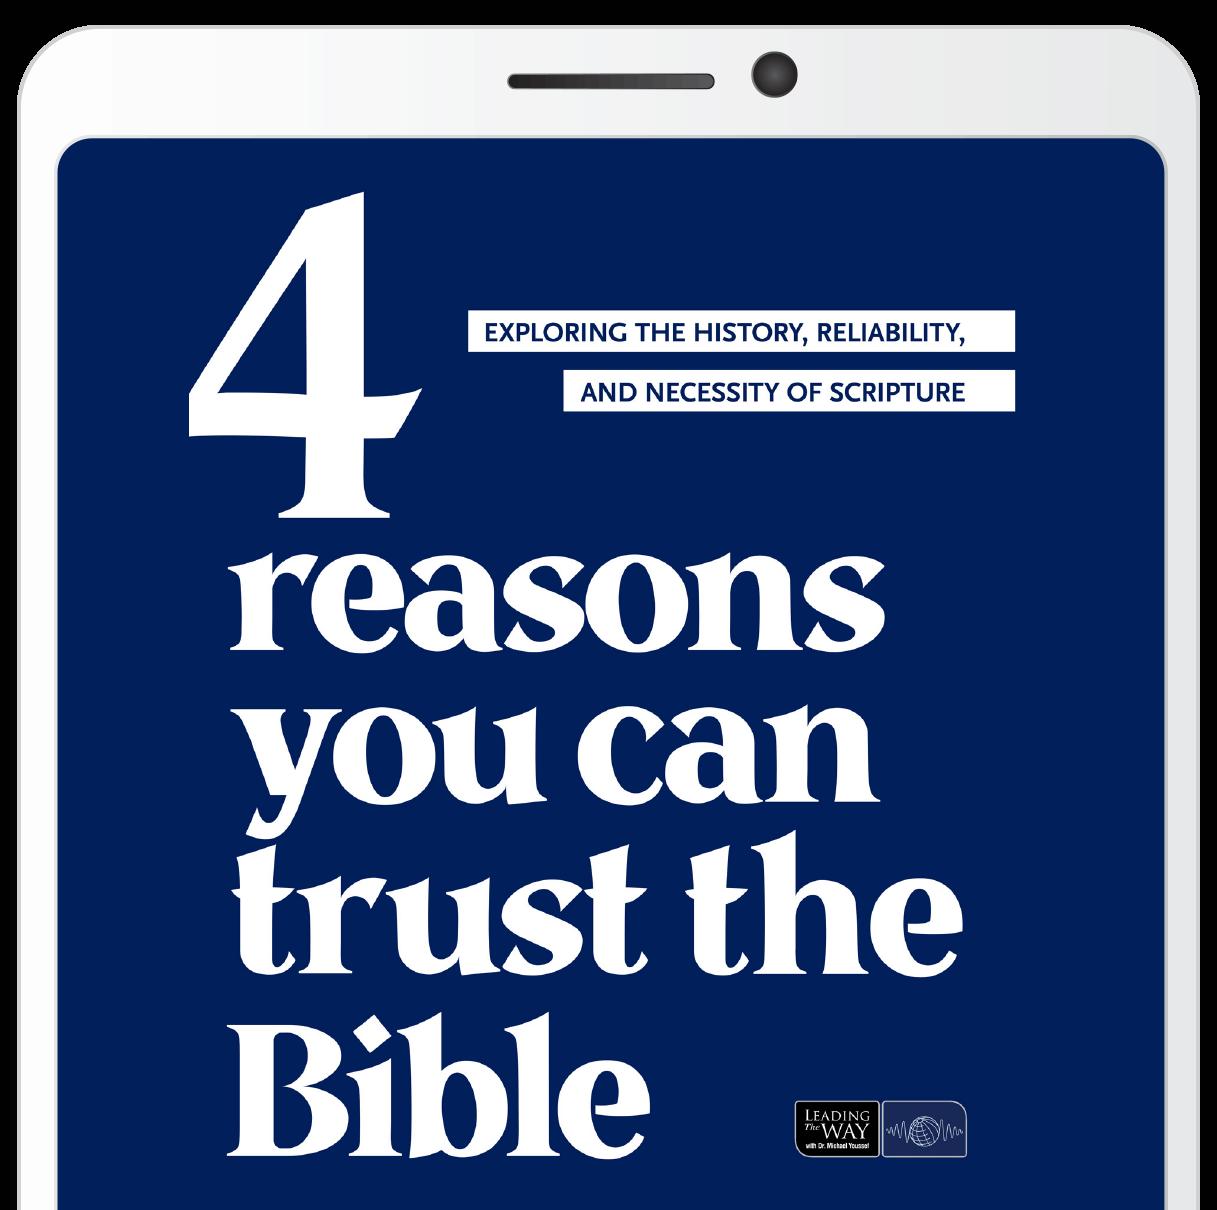 4-reasons_ipad_2